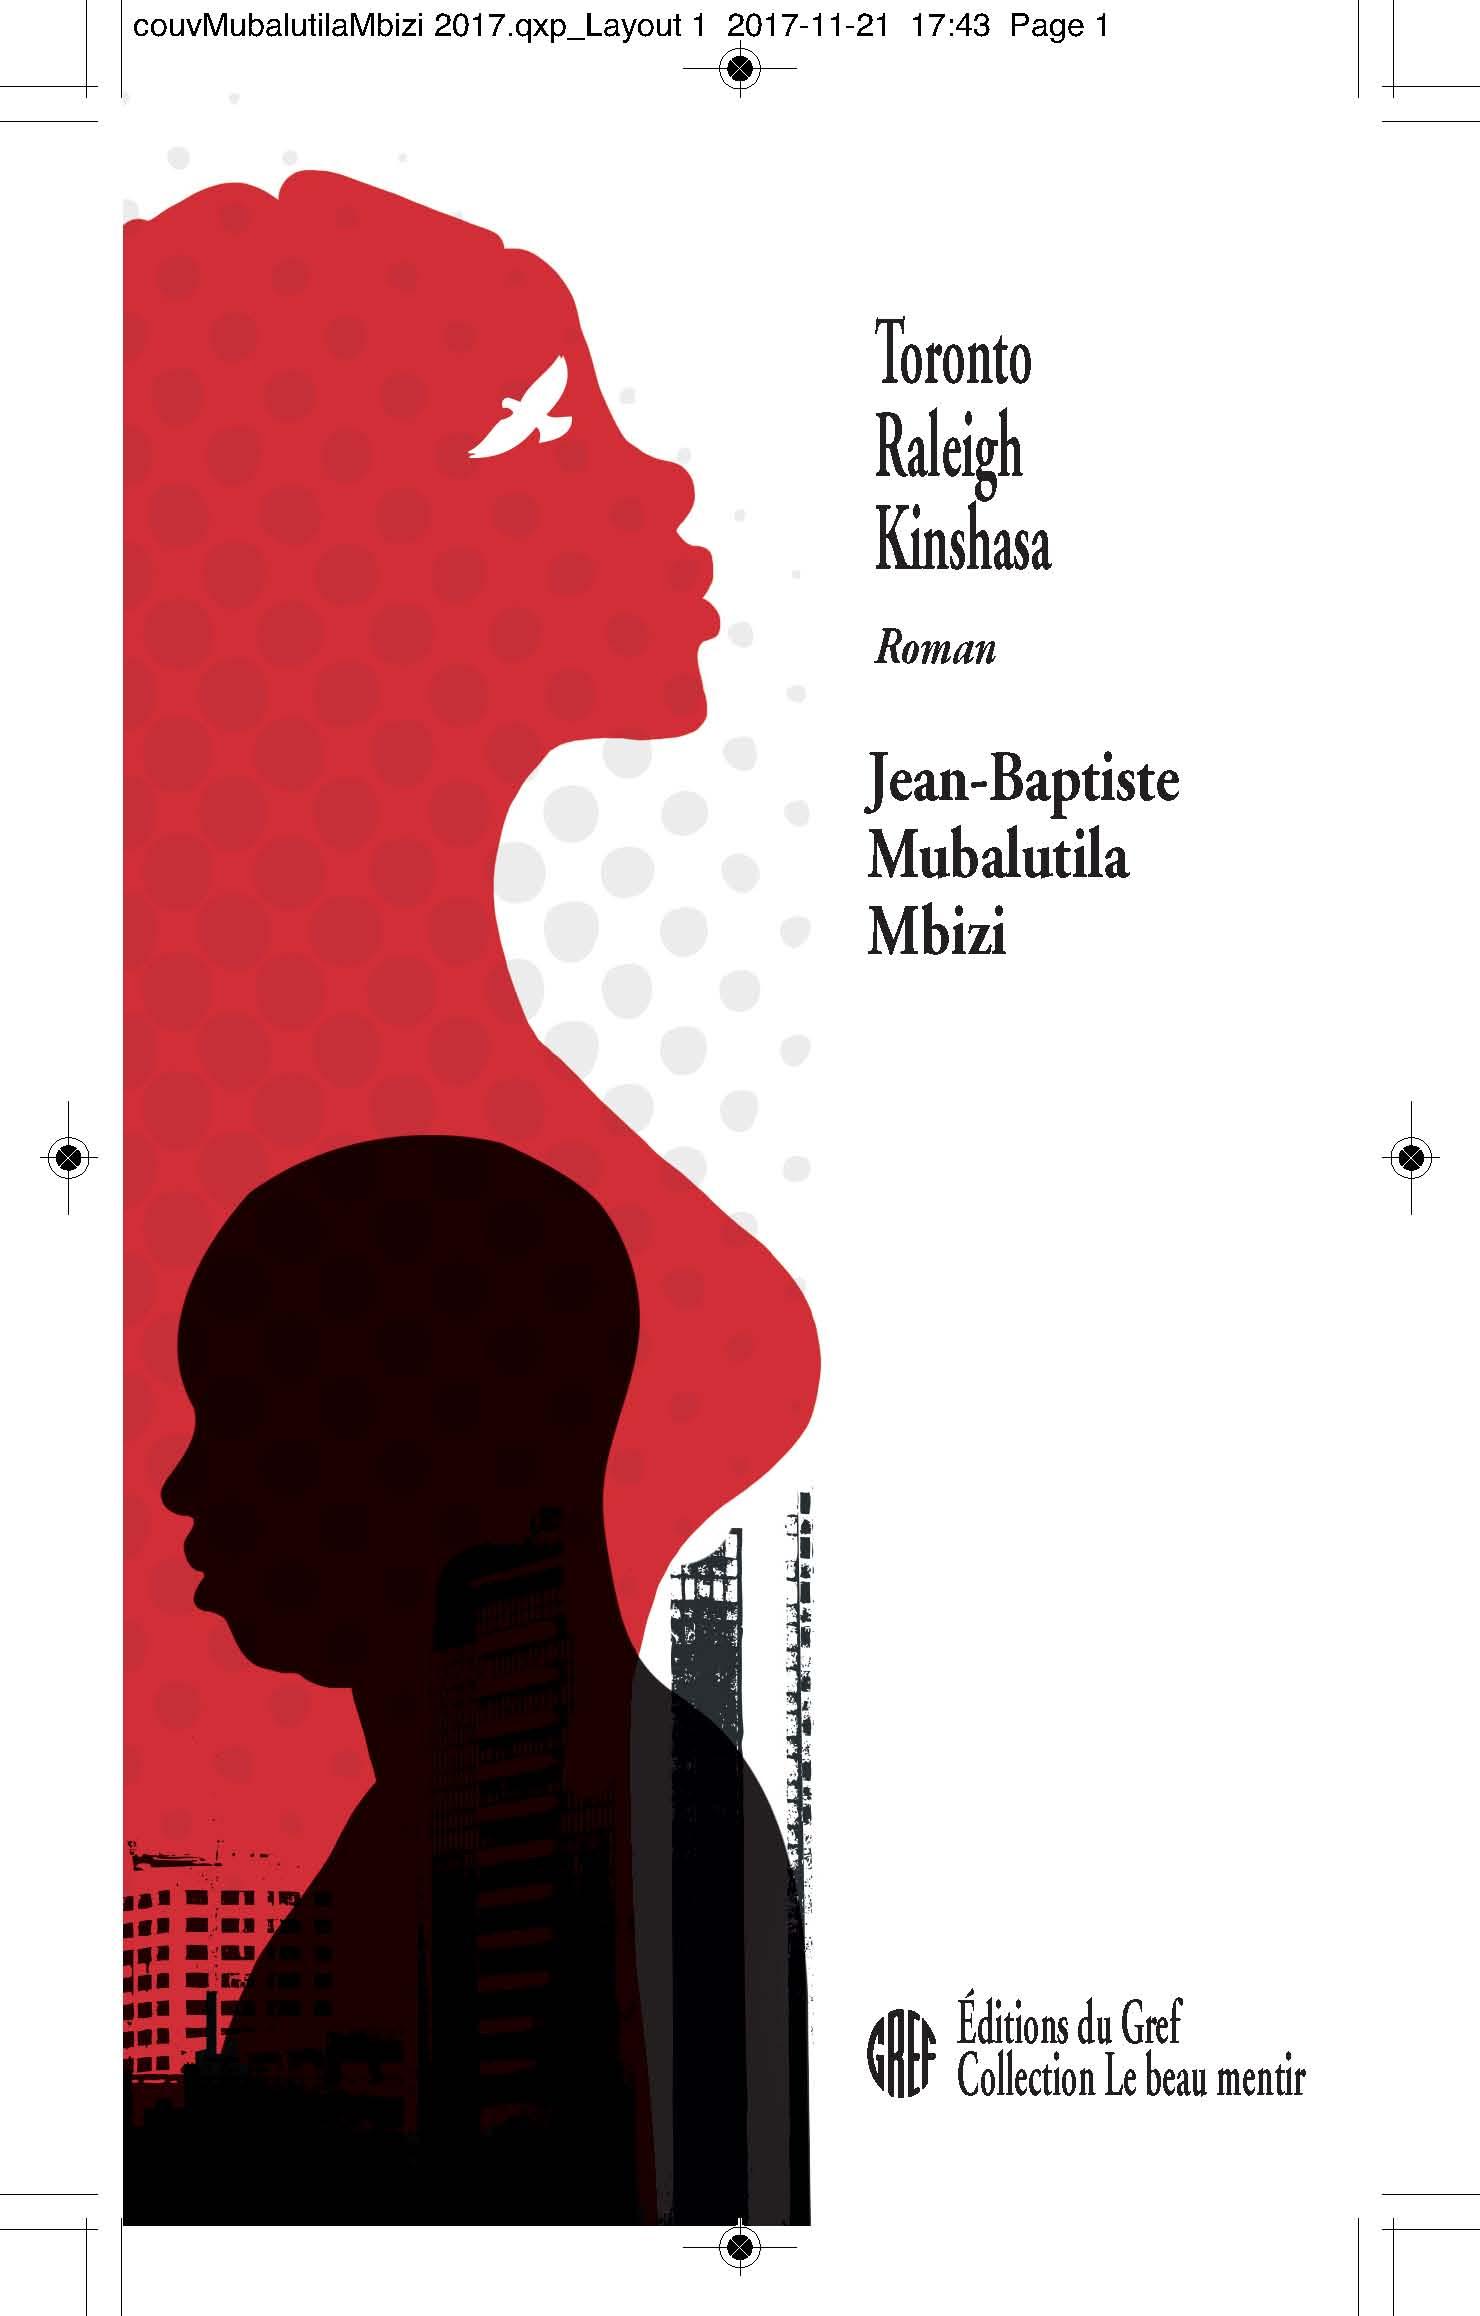 Toronto-Raleigh-Kinshasa